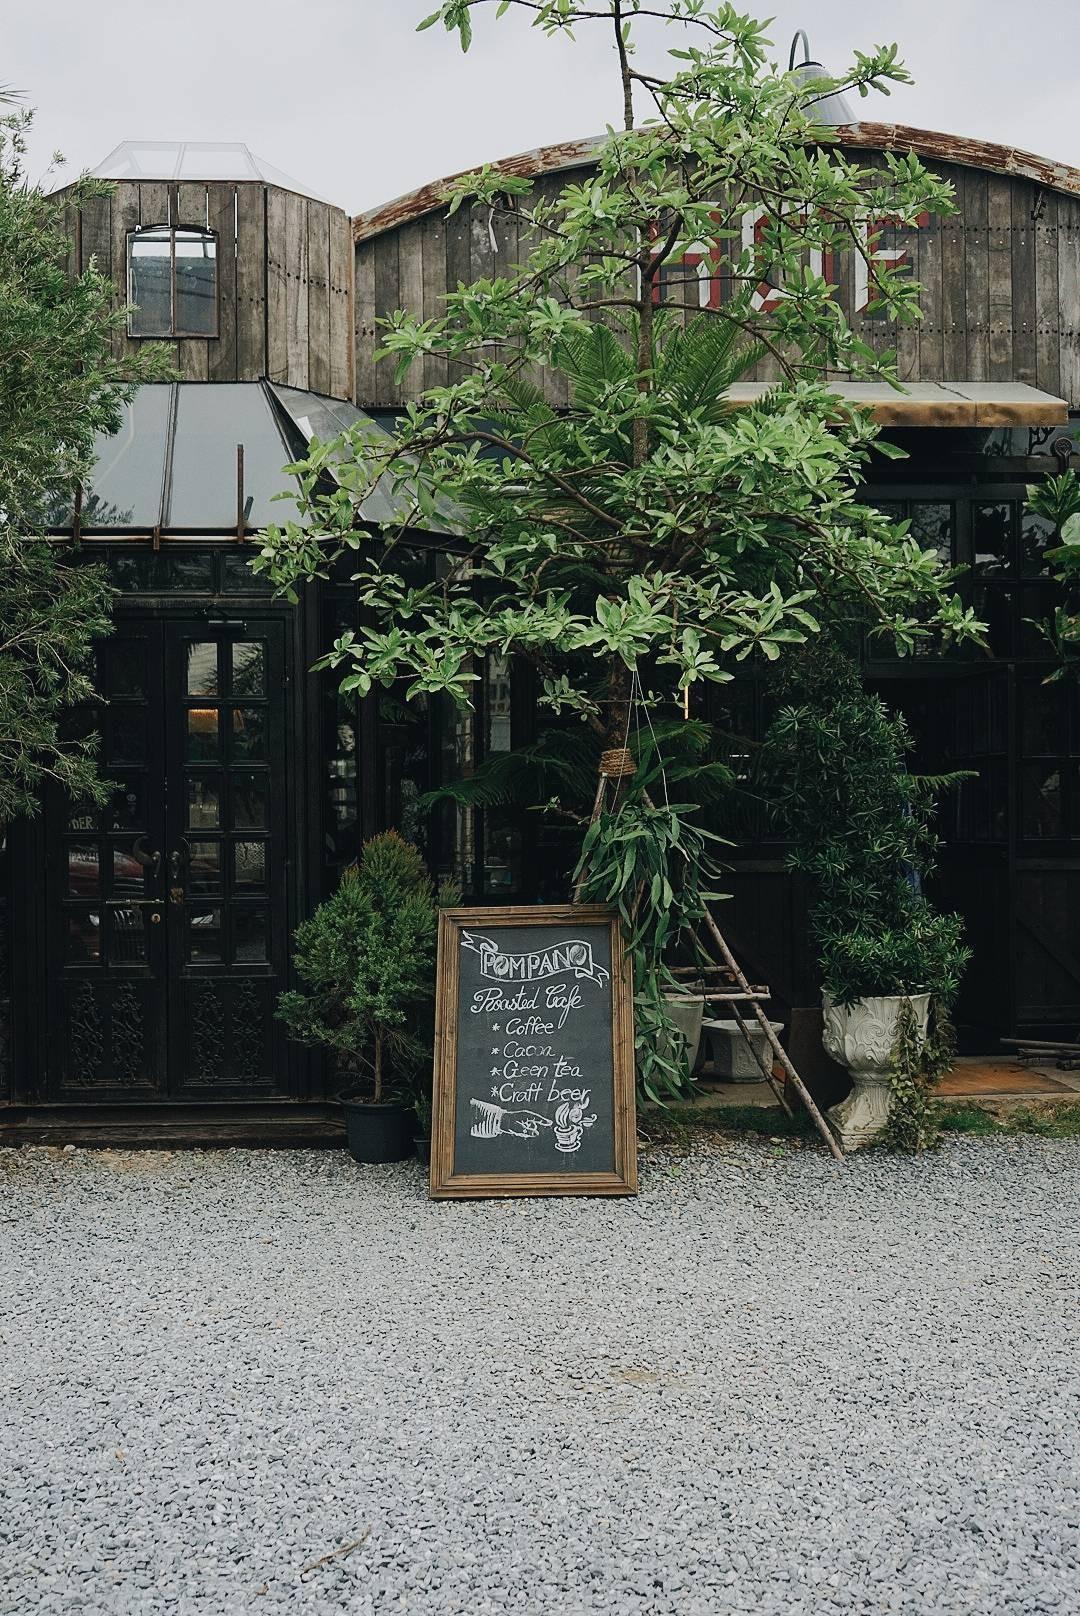 Pompano Roasted Cafe จตุจักร - กำแพงเพชร  - หมอชิต